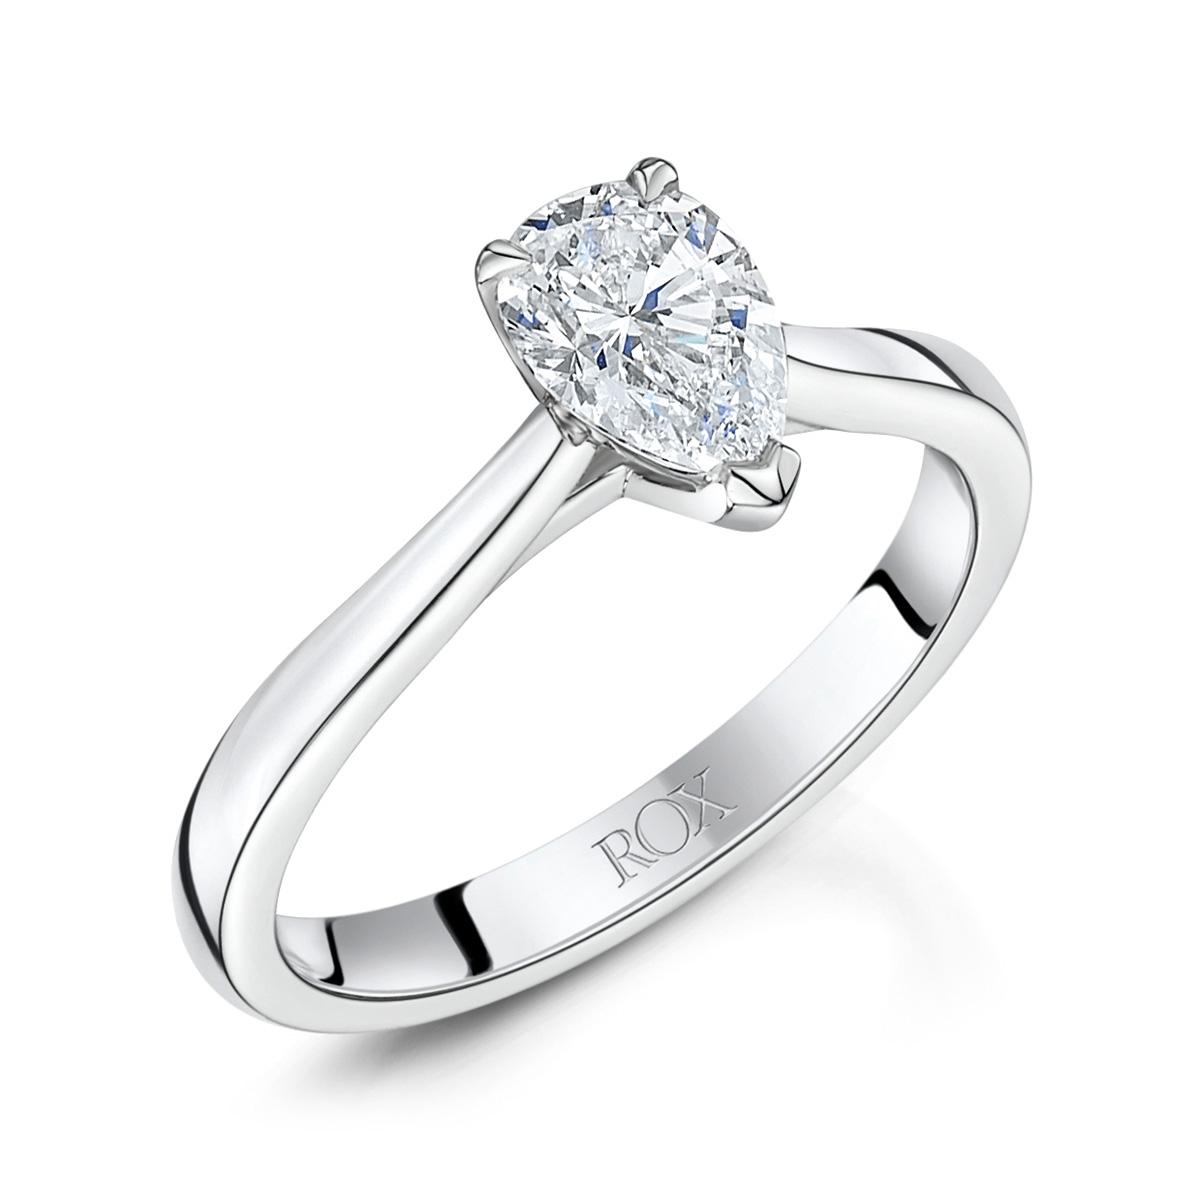 Honour Pear Cut Diamond Ring 0.72cts